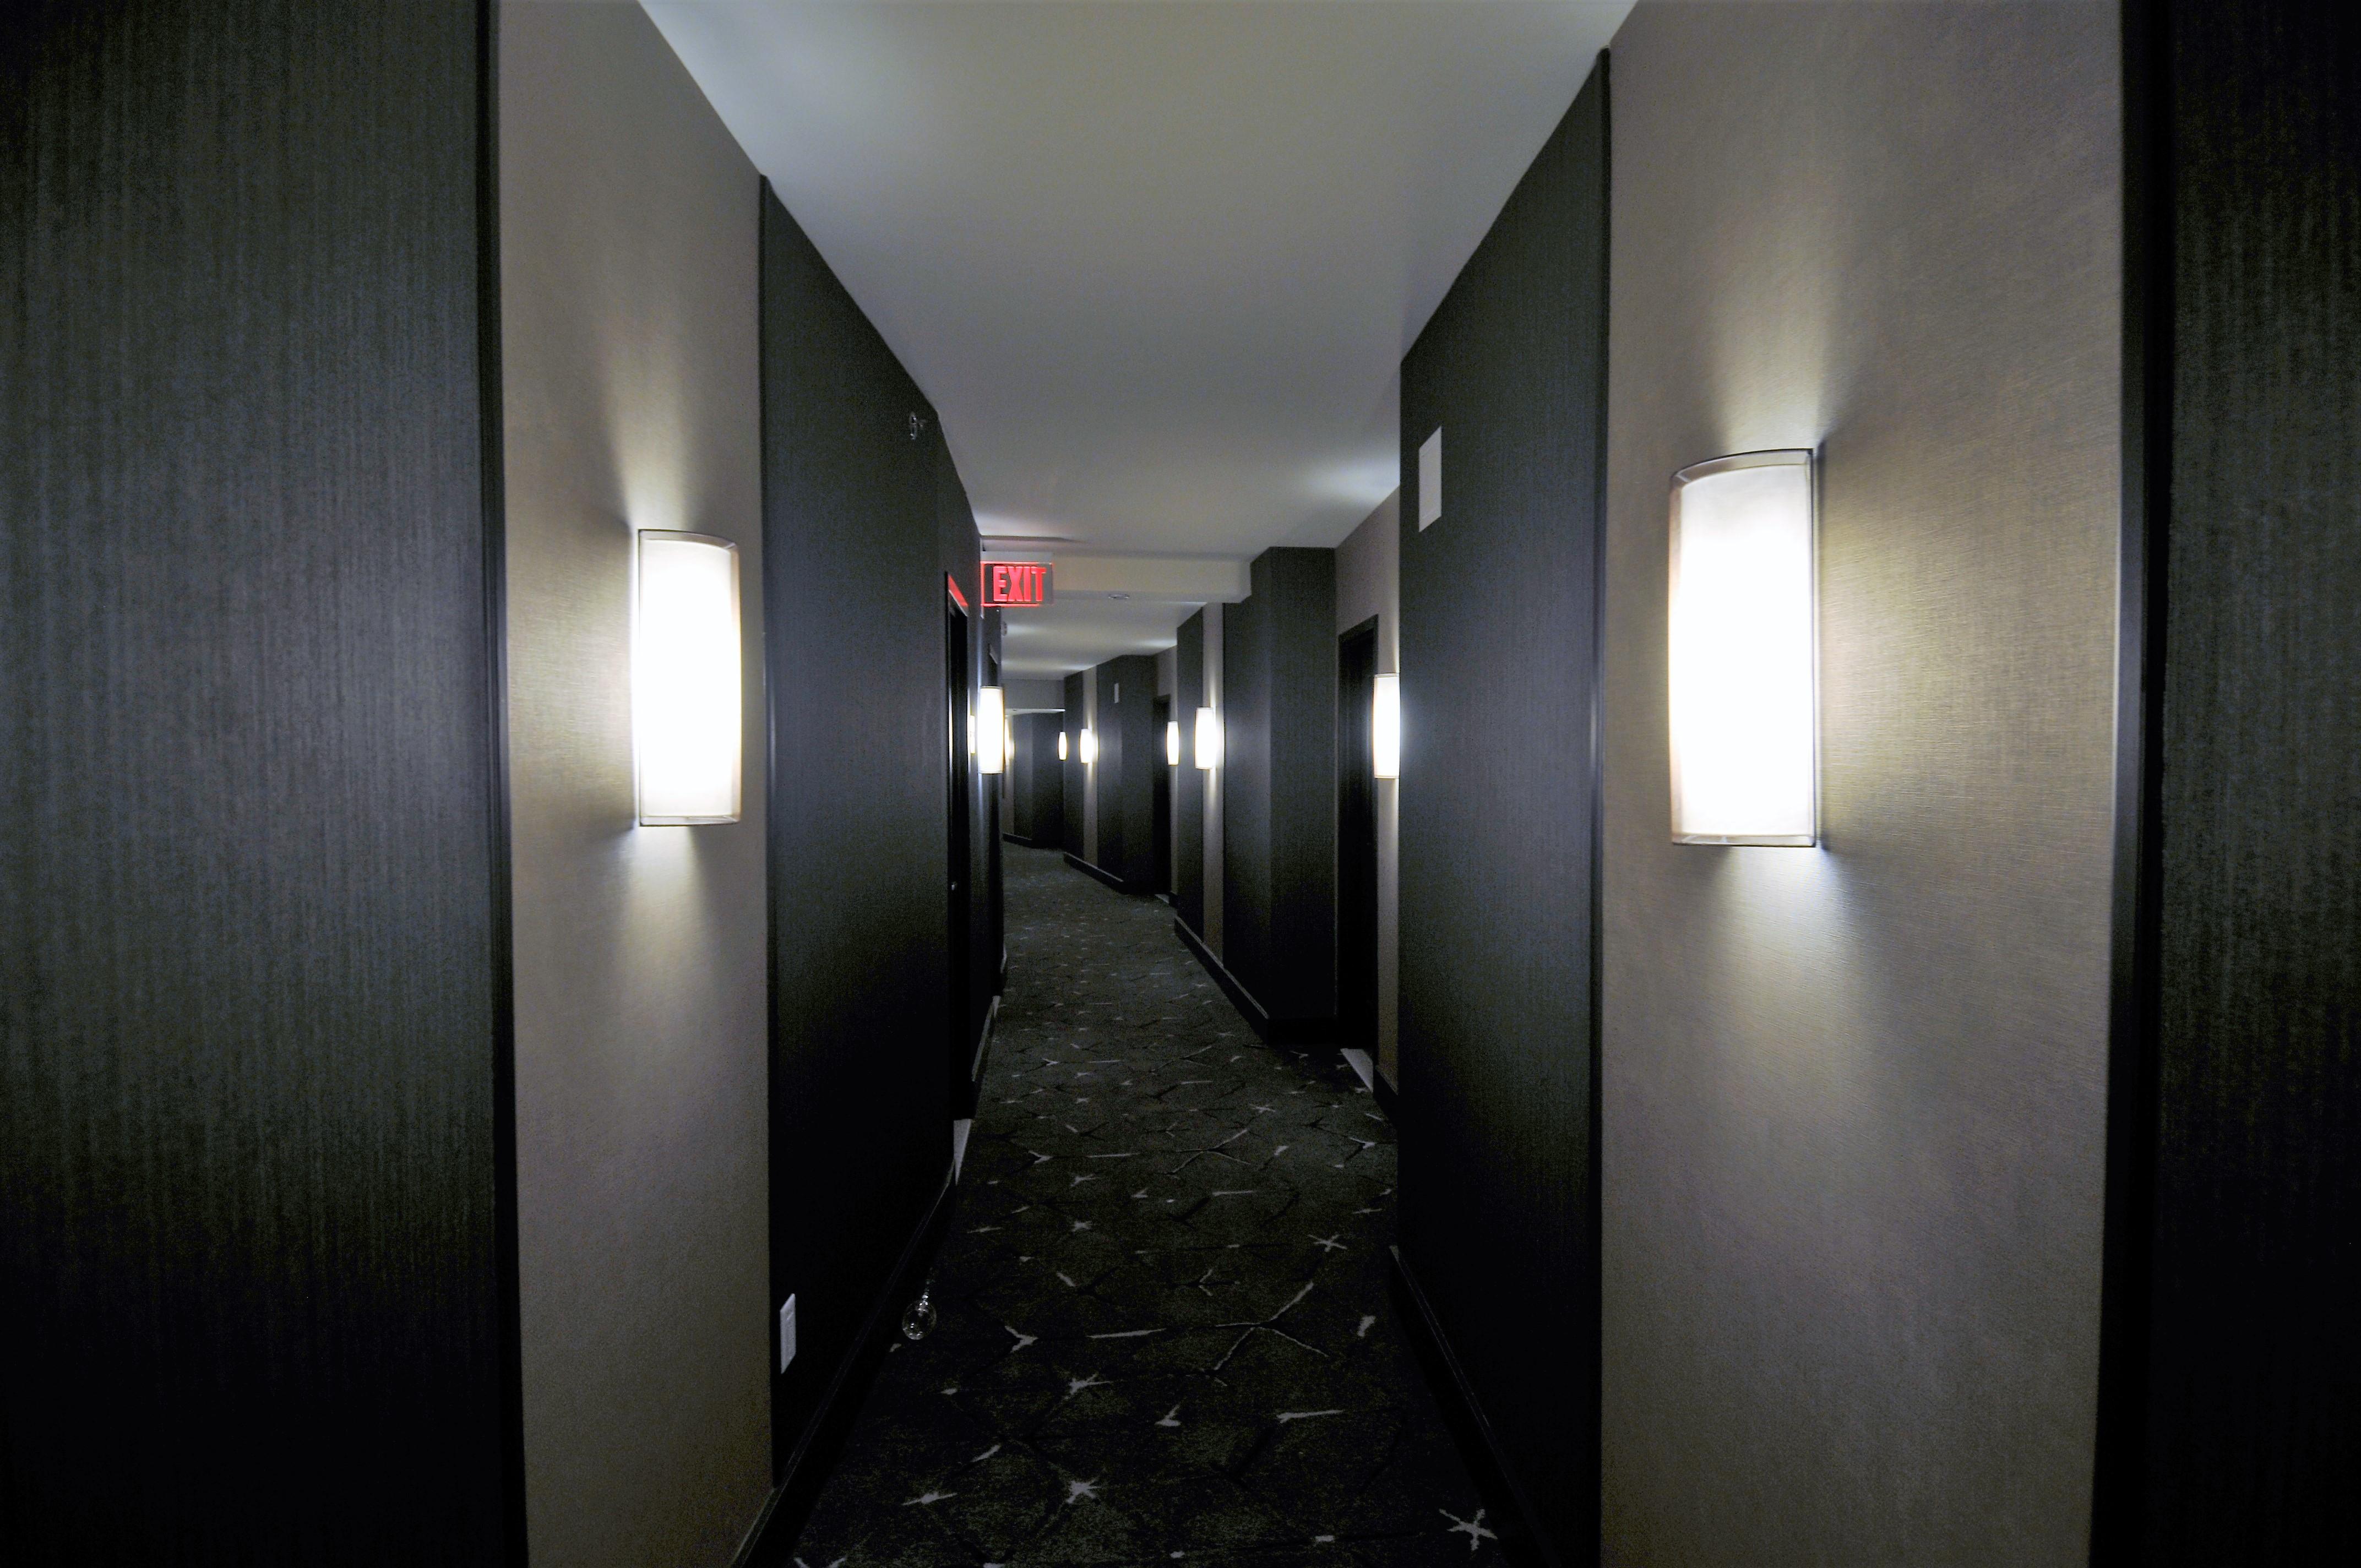 Washington Hilton corridor